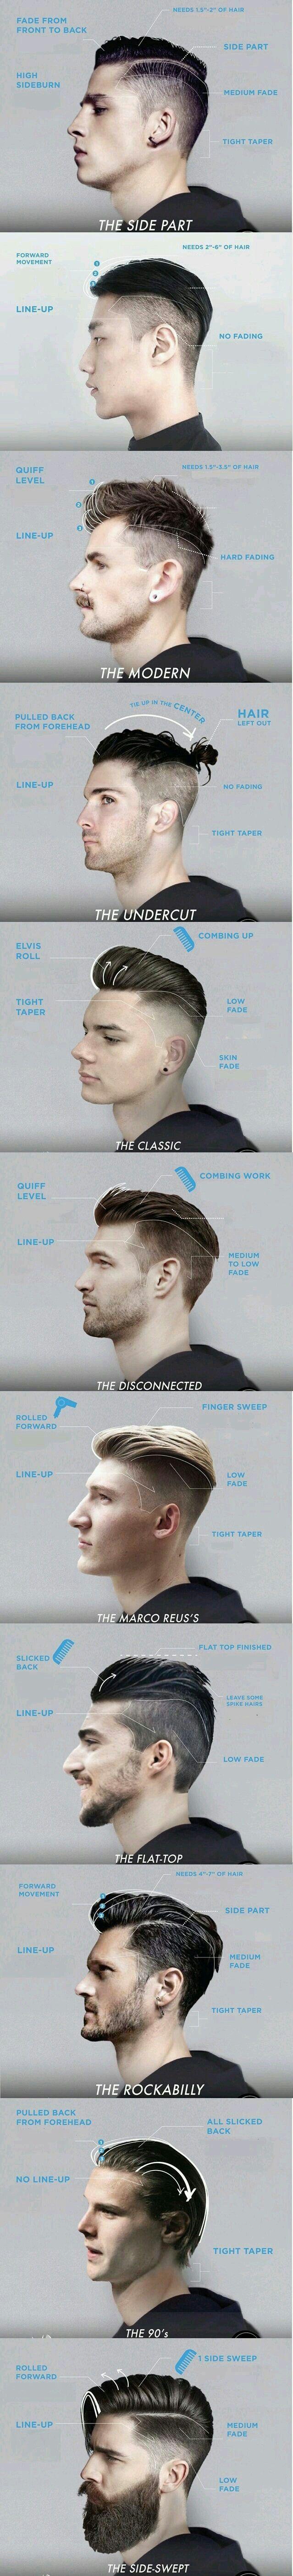 40 best Men s HairCut images on Pinterest